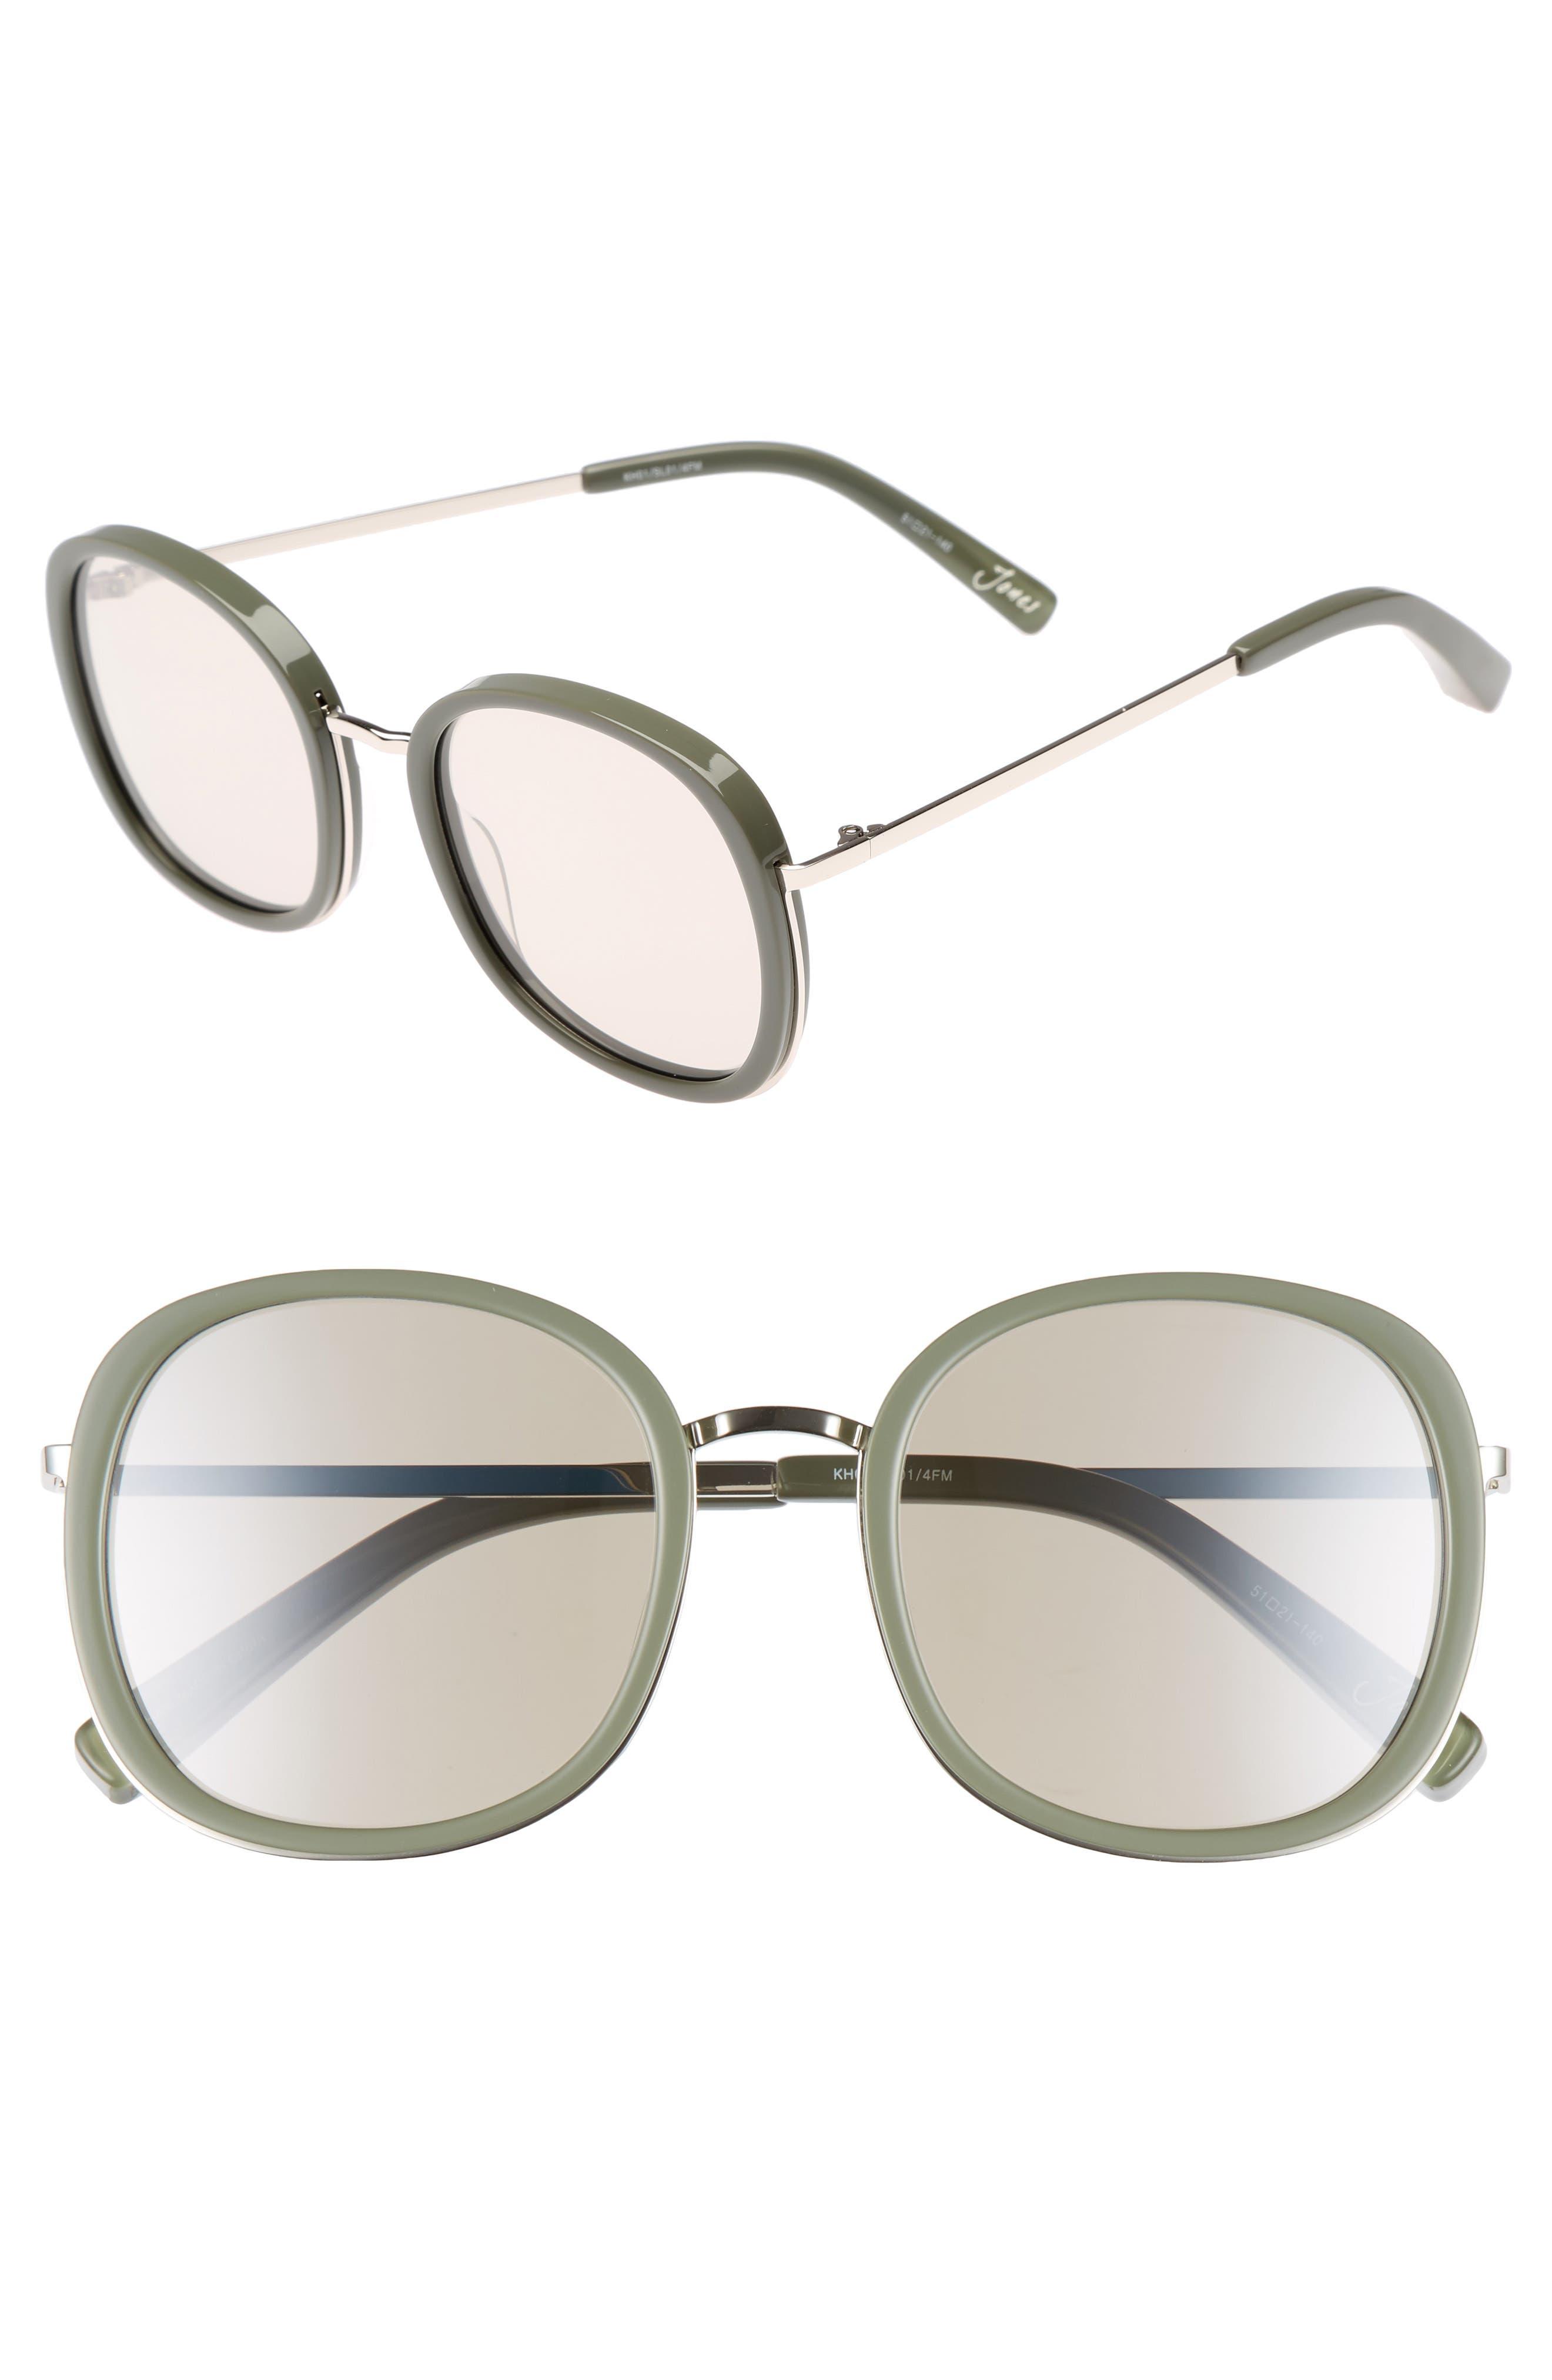 ELIZABETH AND JAMES Jones 51mm Round Sunglasses, Main, color, KHAKI AND SILVER